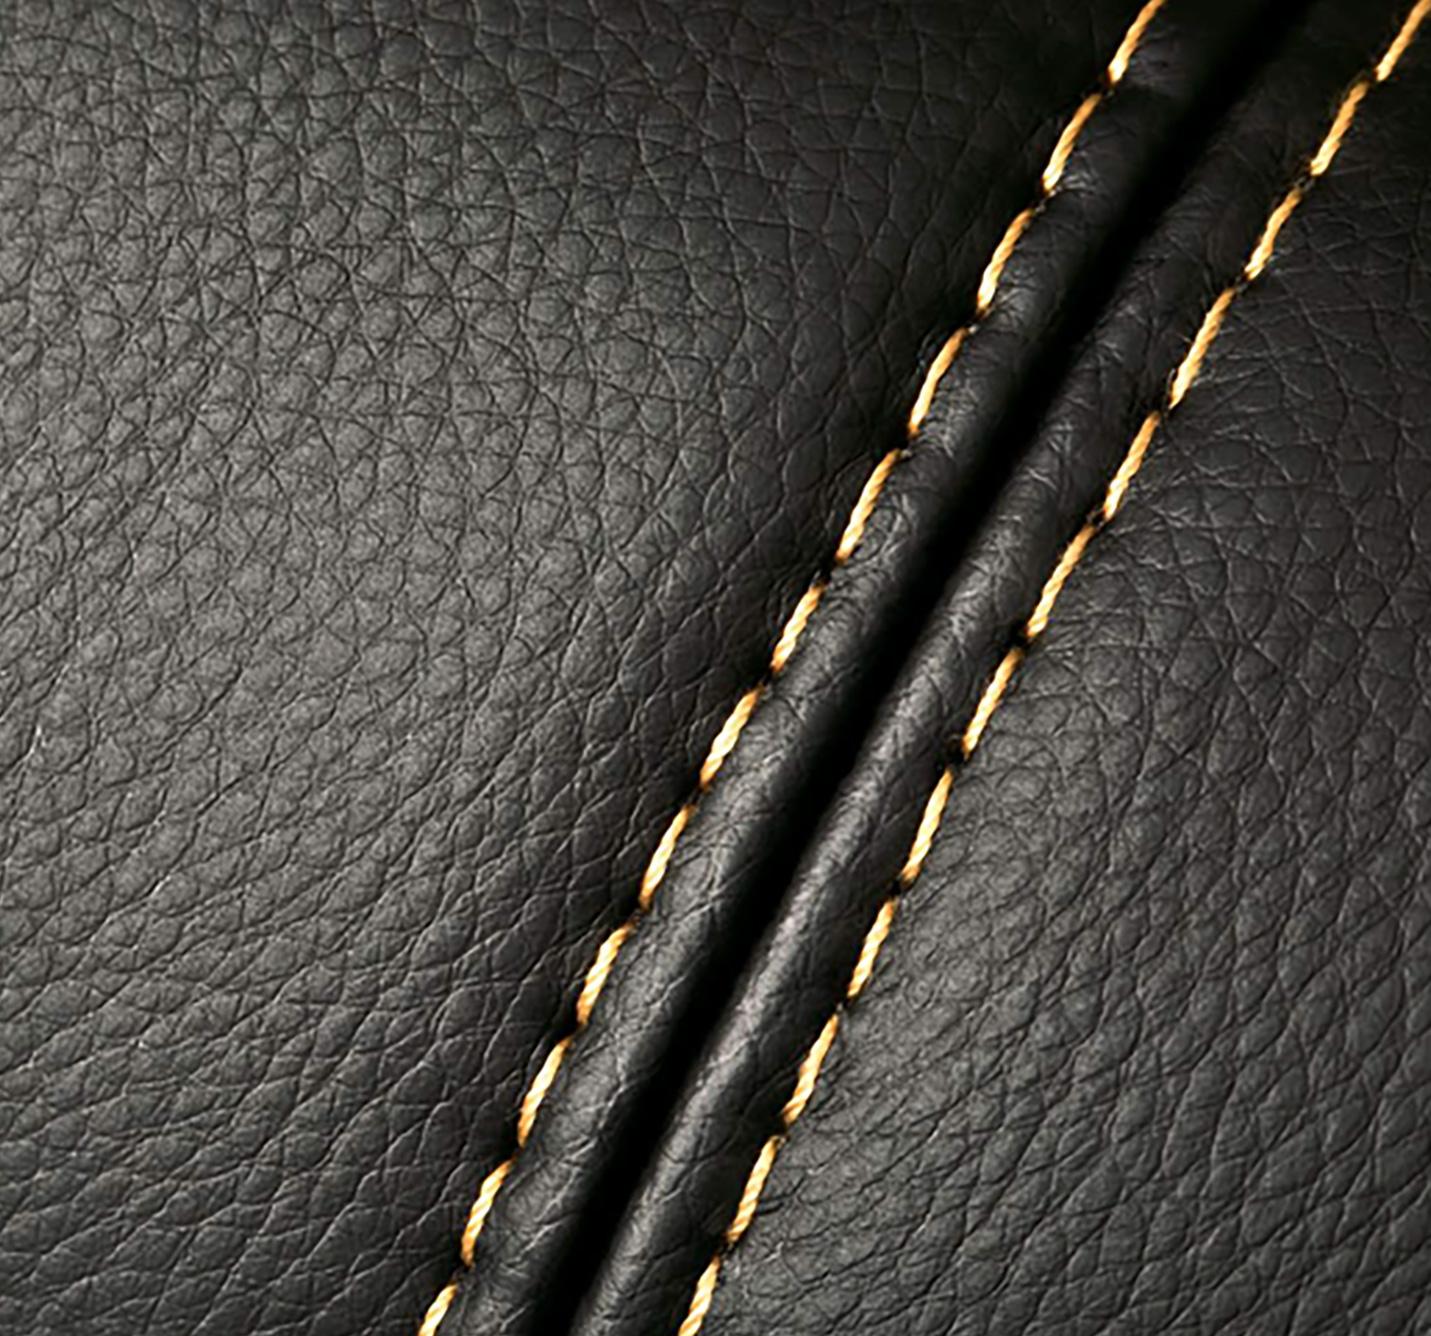 Sustaining Quality Leather